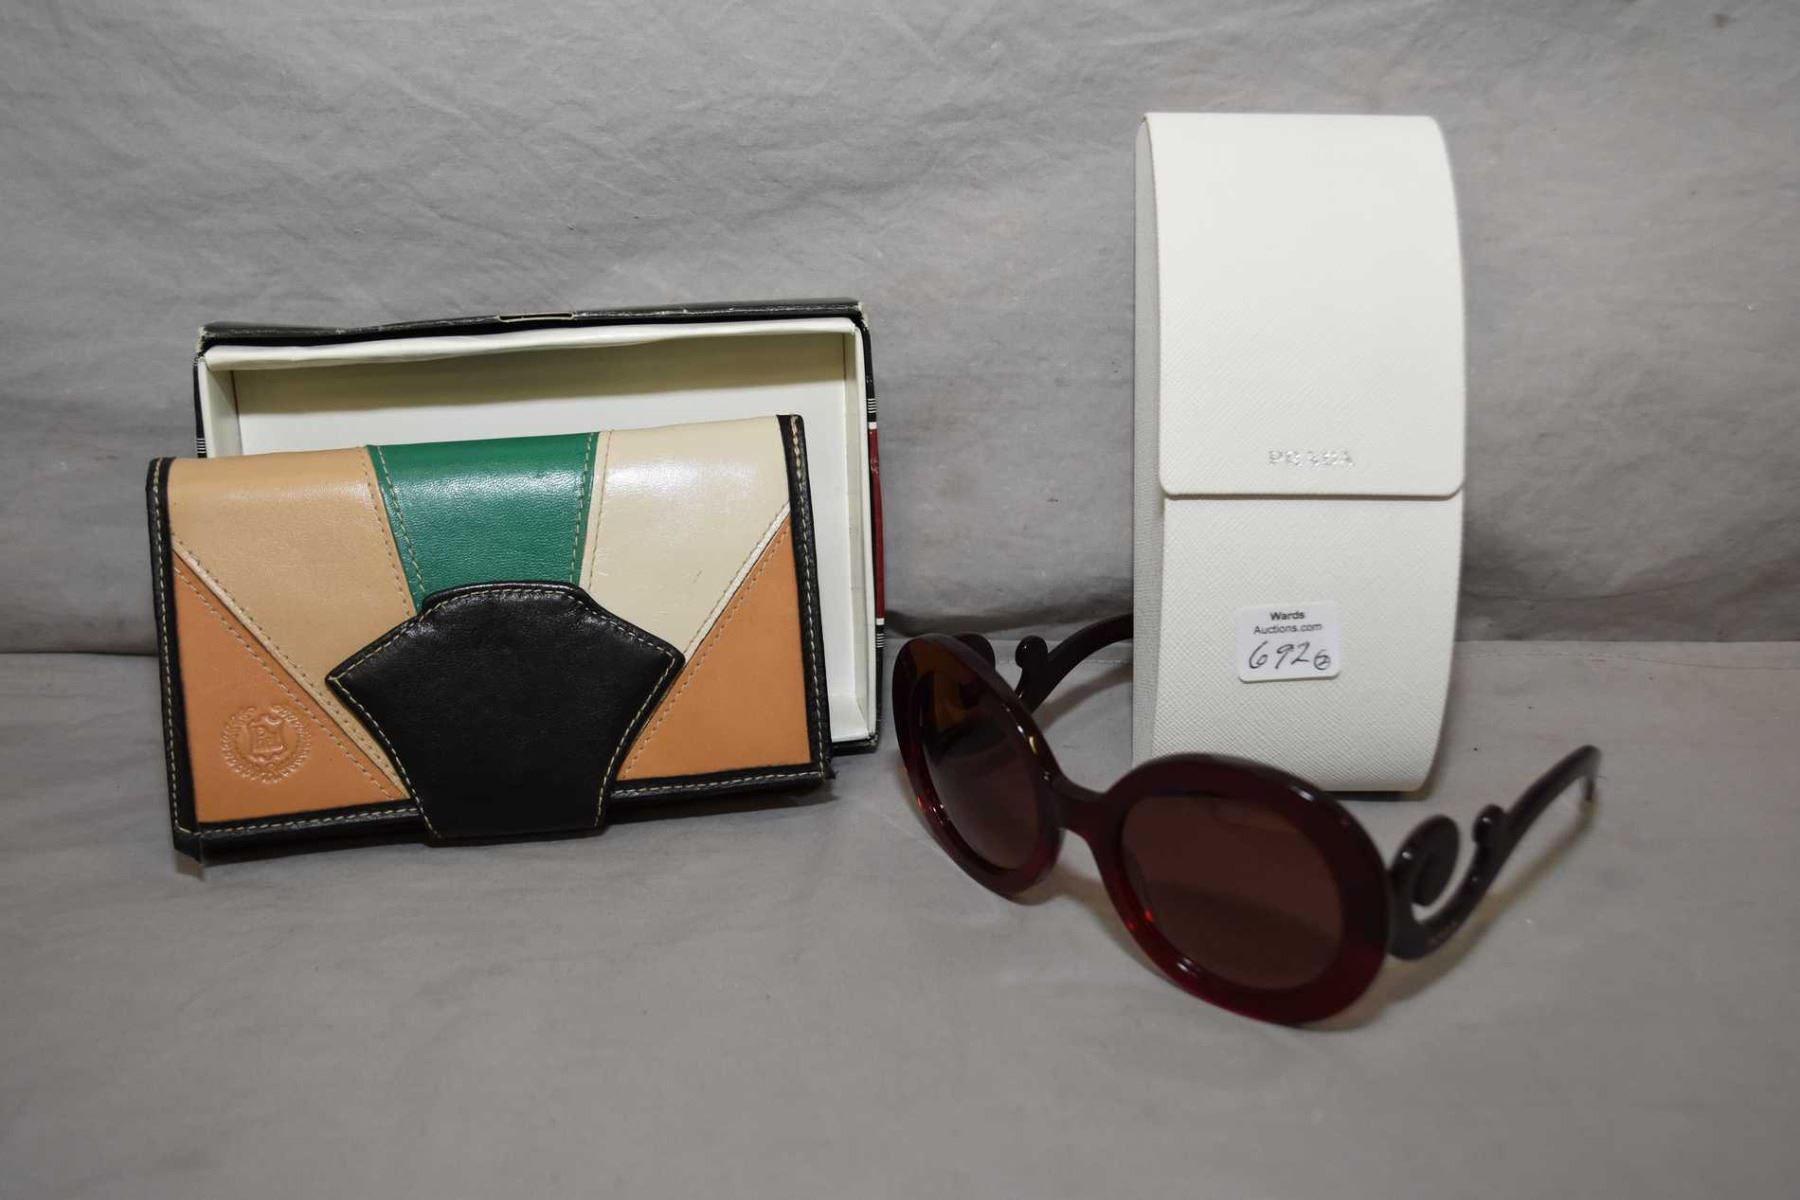 d2ad6bcb9bc5 Image 1 : Pair of Prada sunglasses in original case and a David Galindo  leather wallet